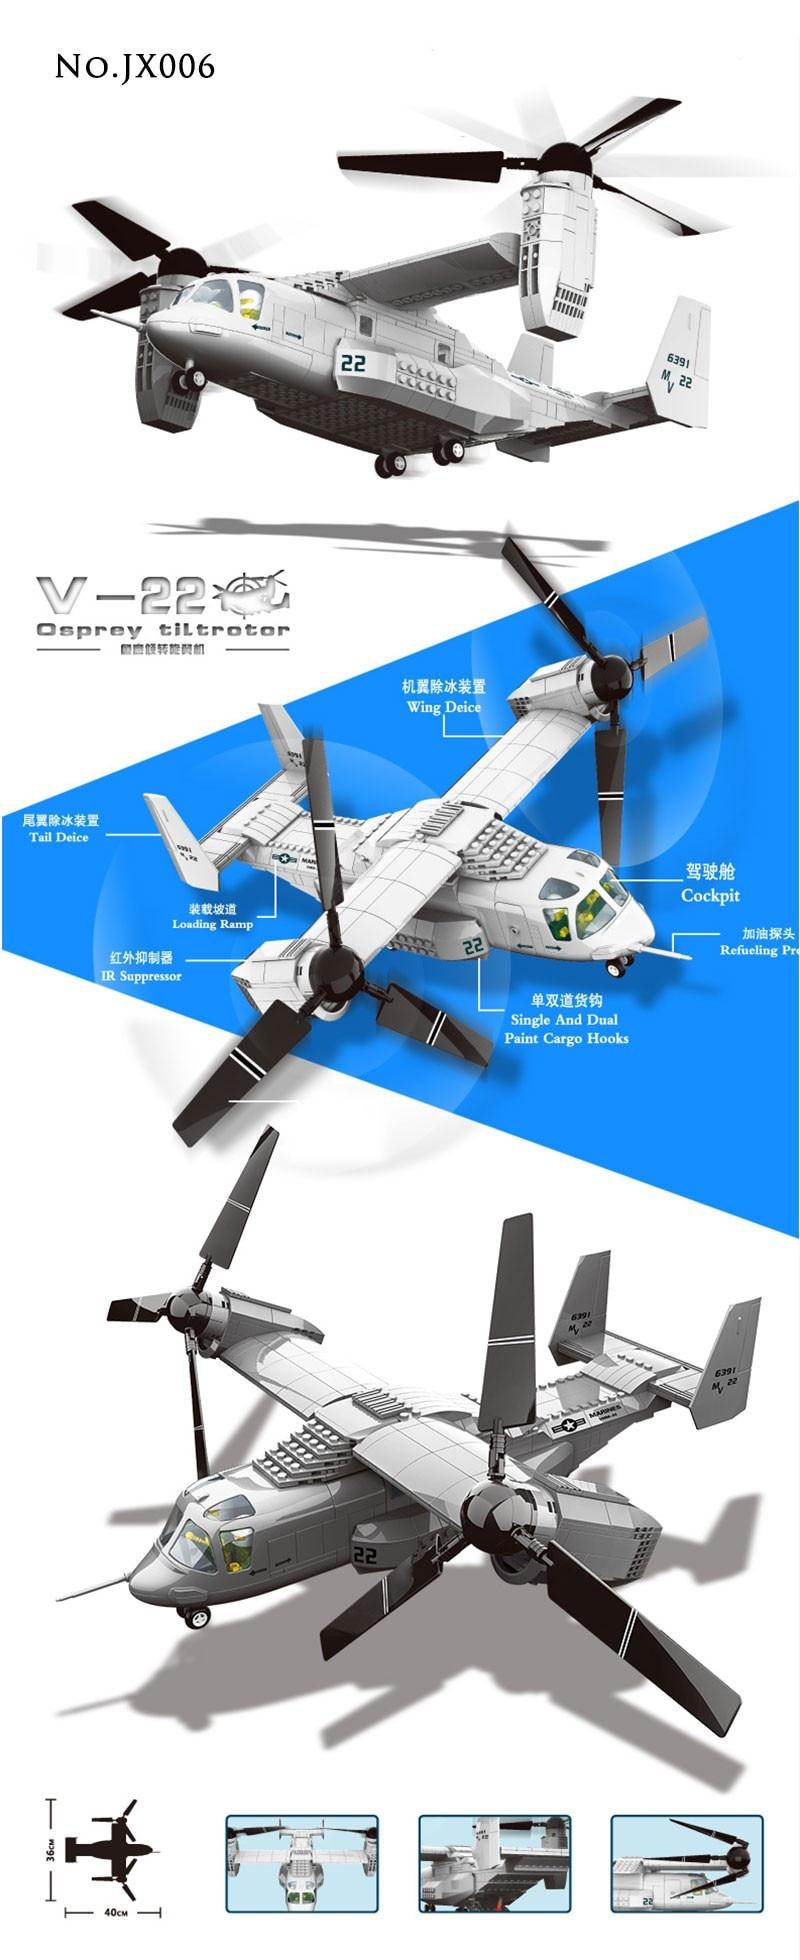 Wange Building Blocks Military F15 Fighter J-15 V-22 Osprey Tiltrotor Aircraft Helicopter Model Building Kits Toys For Children 6